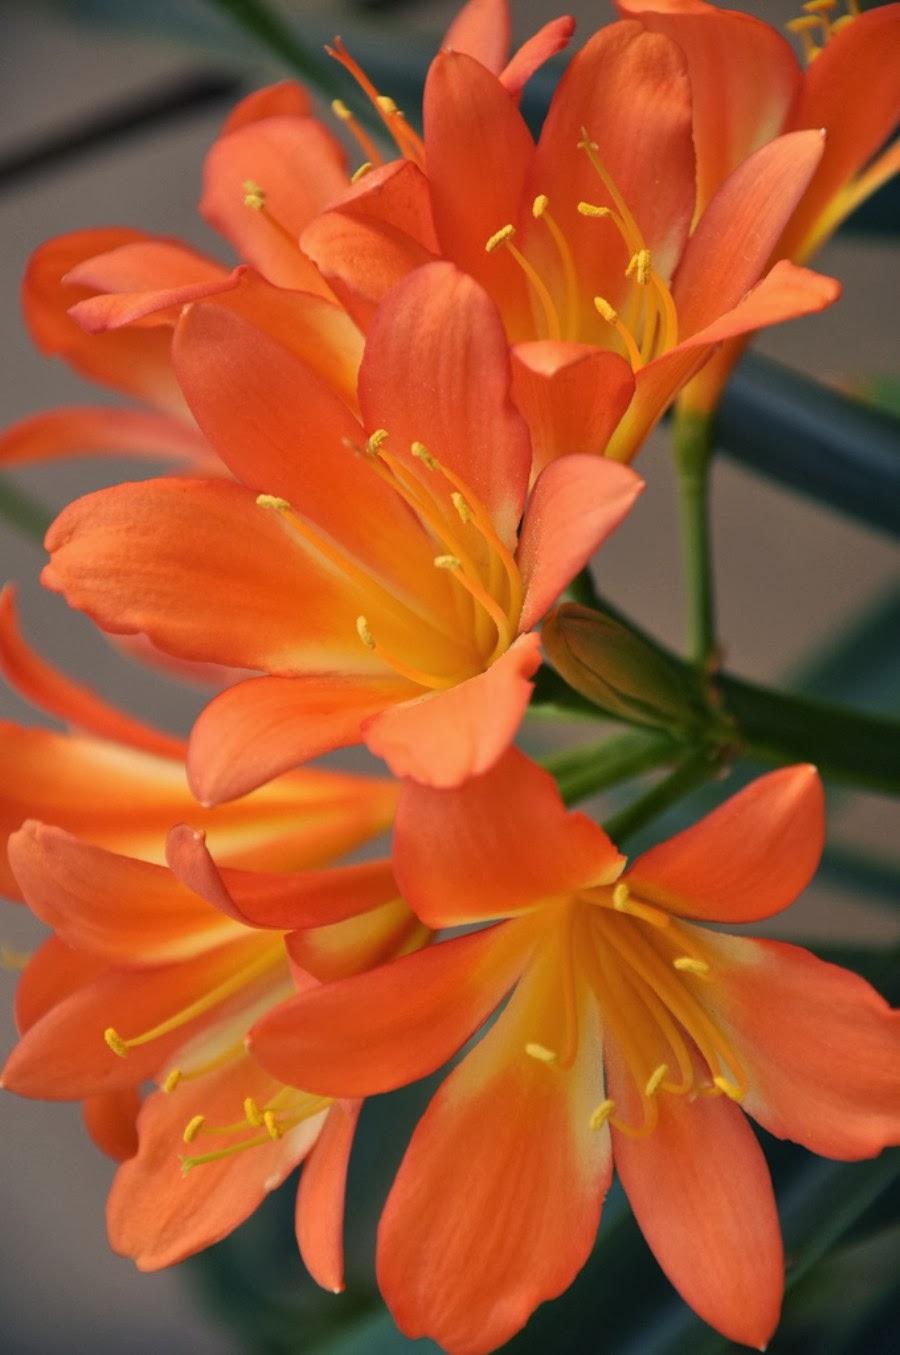 Flowers online 2018 most beautiful flowers wallpapers flowers online izmirmasajfo